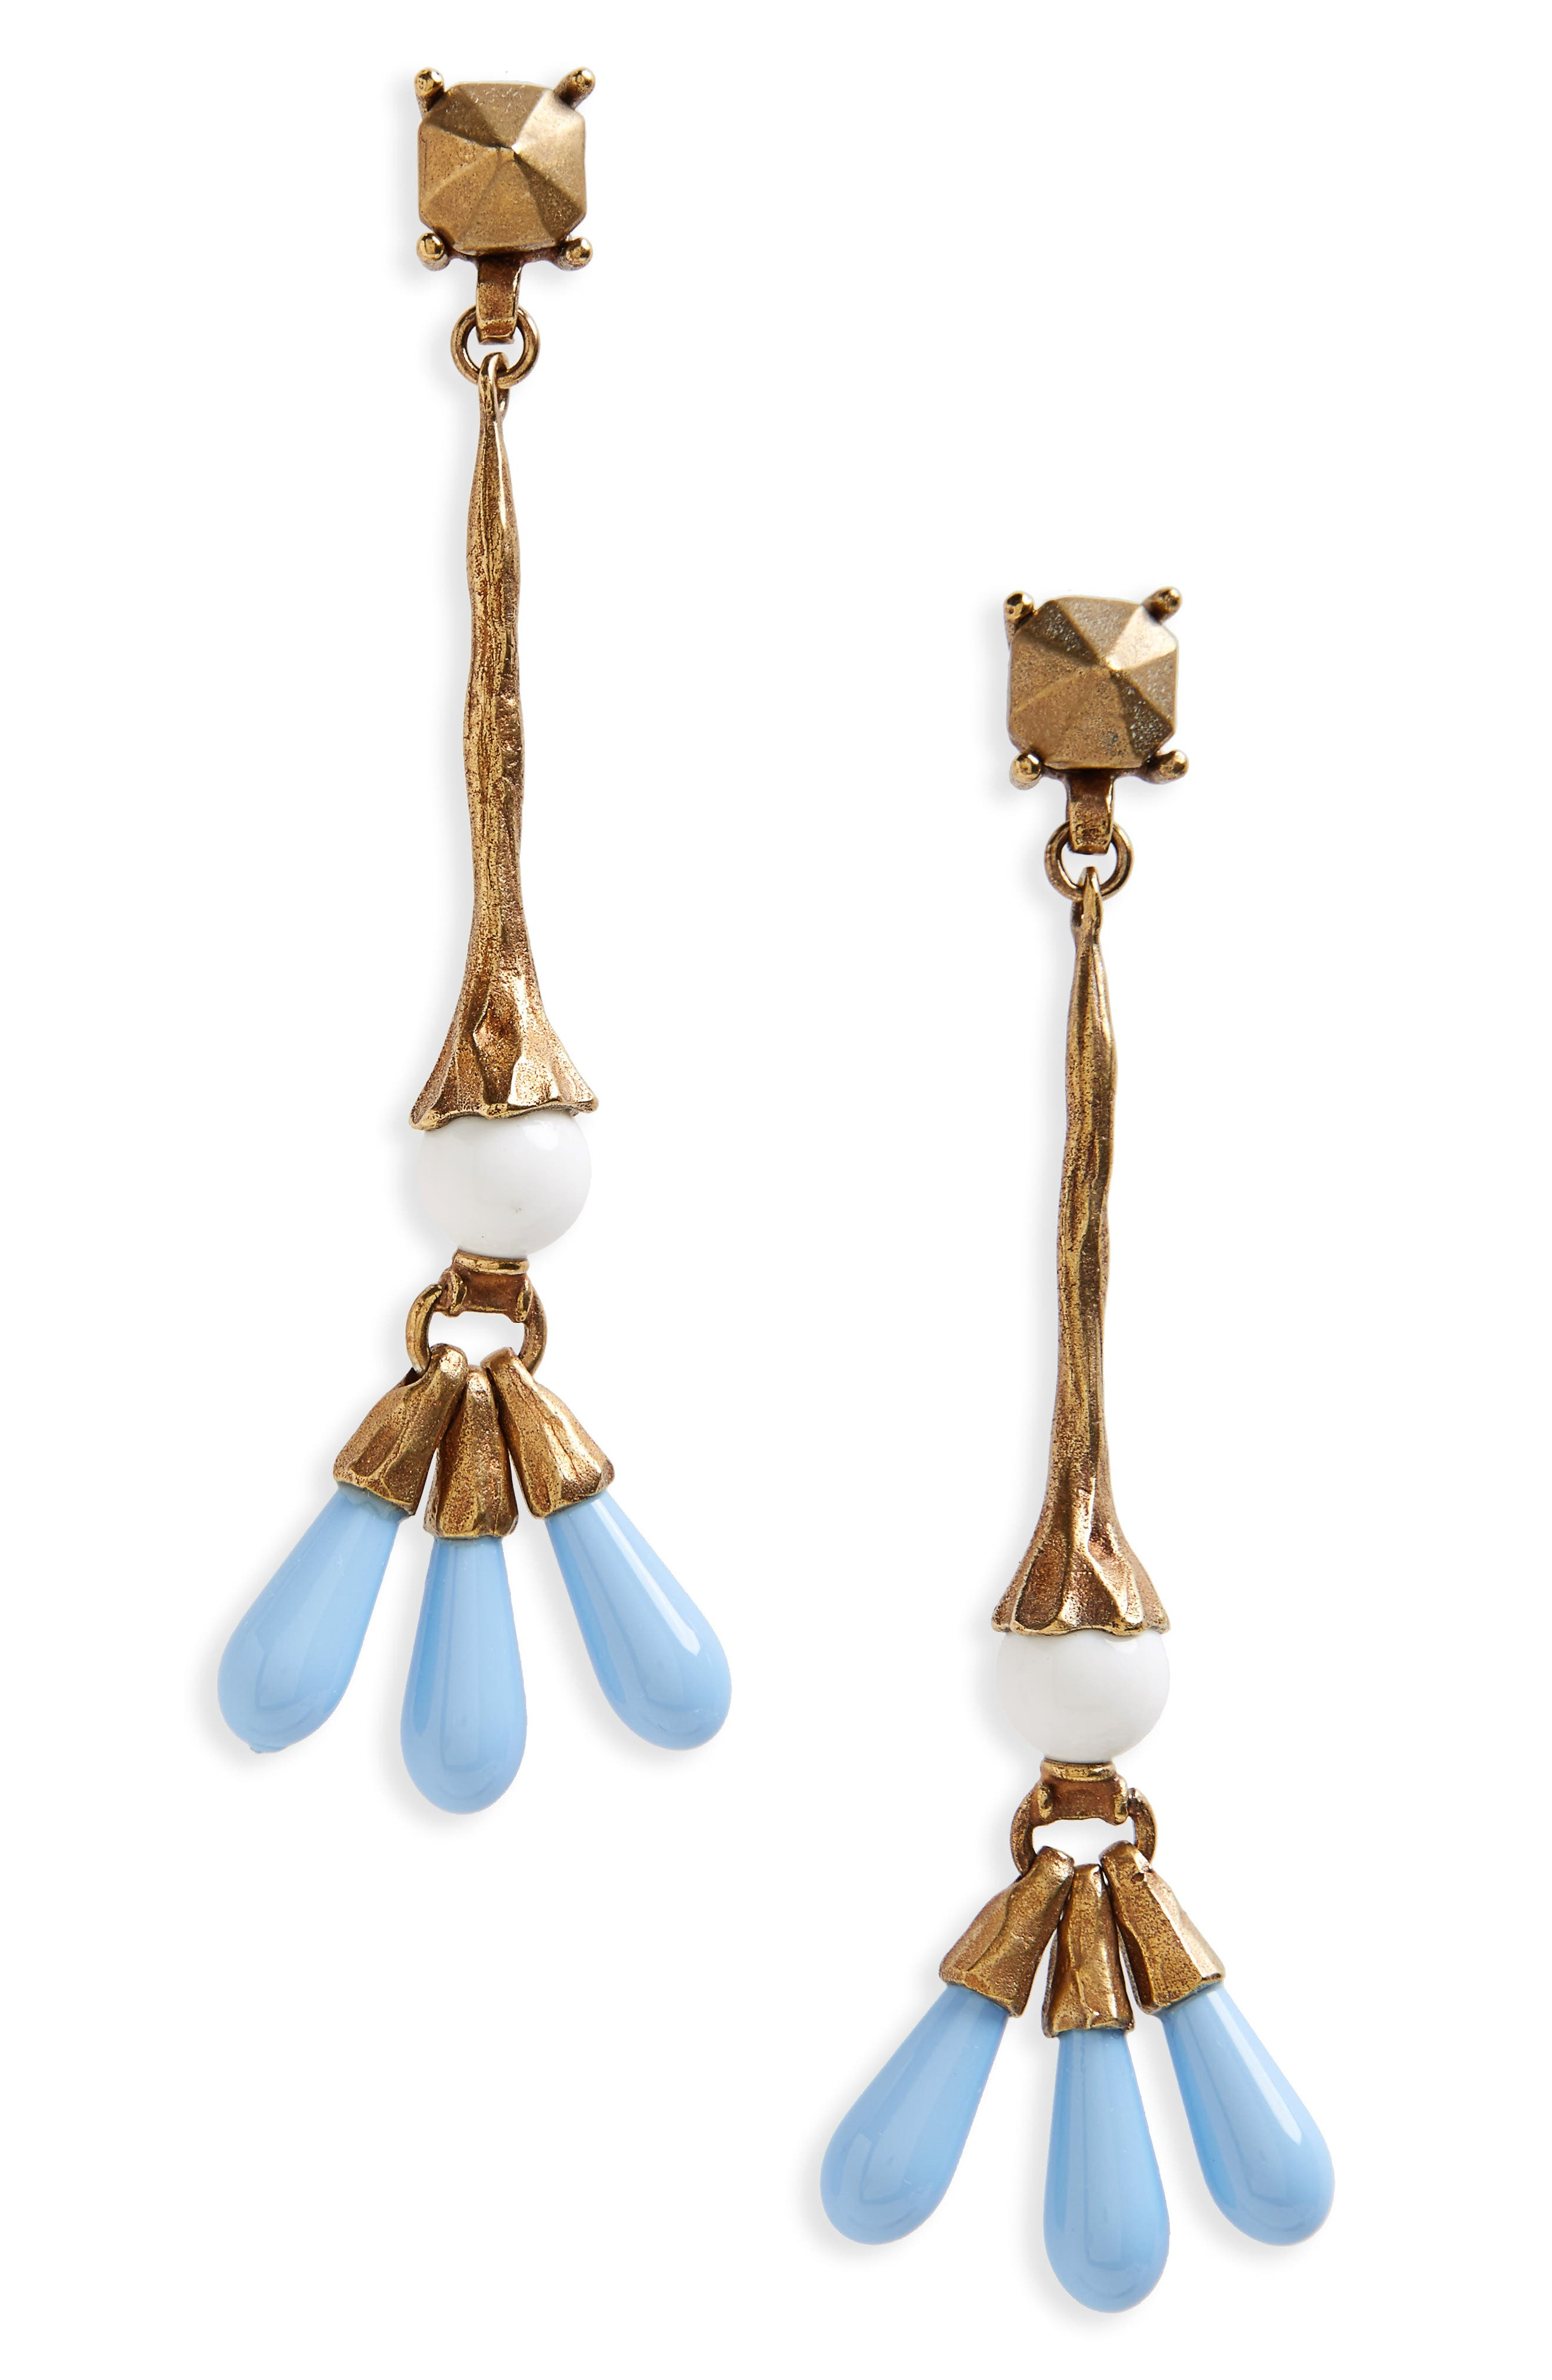 Drop Earrings,                         Main,                         color, A.GOLD/ BIANCO/ TURCHESE